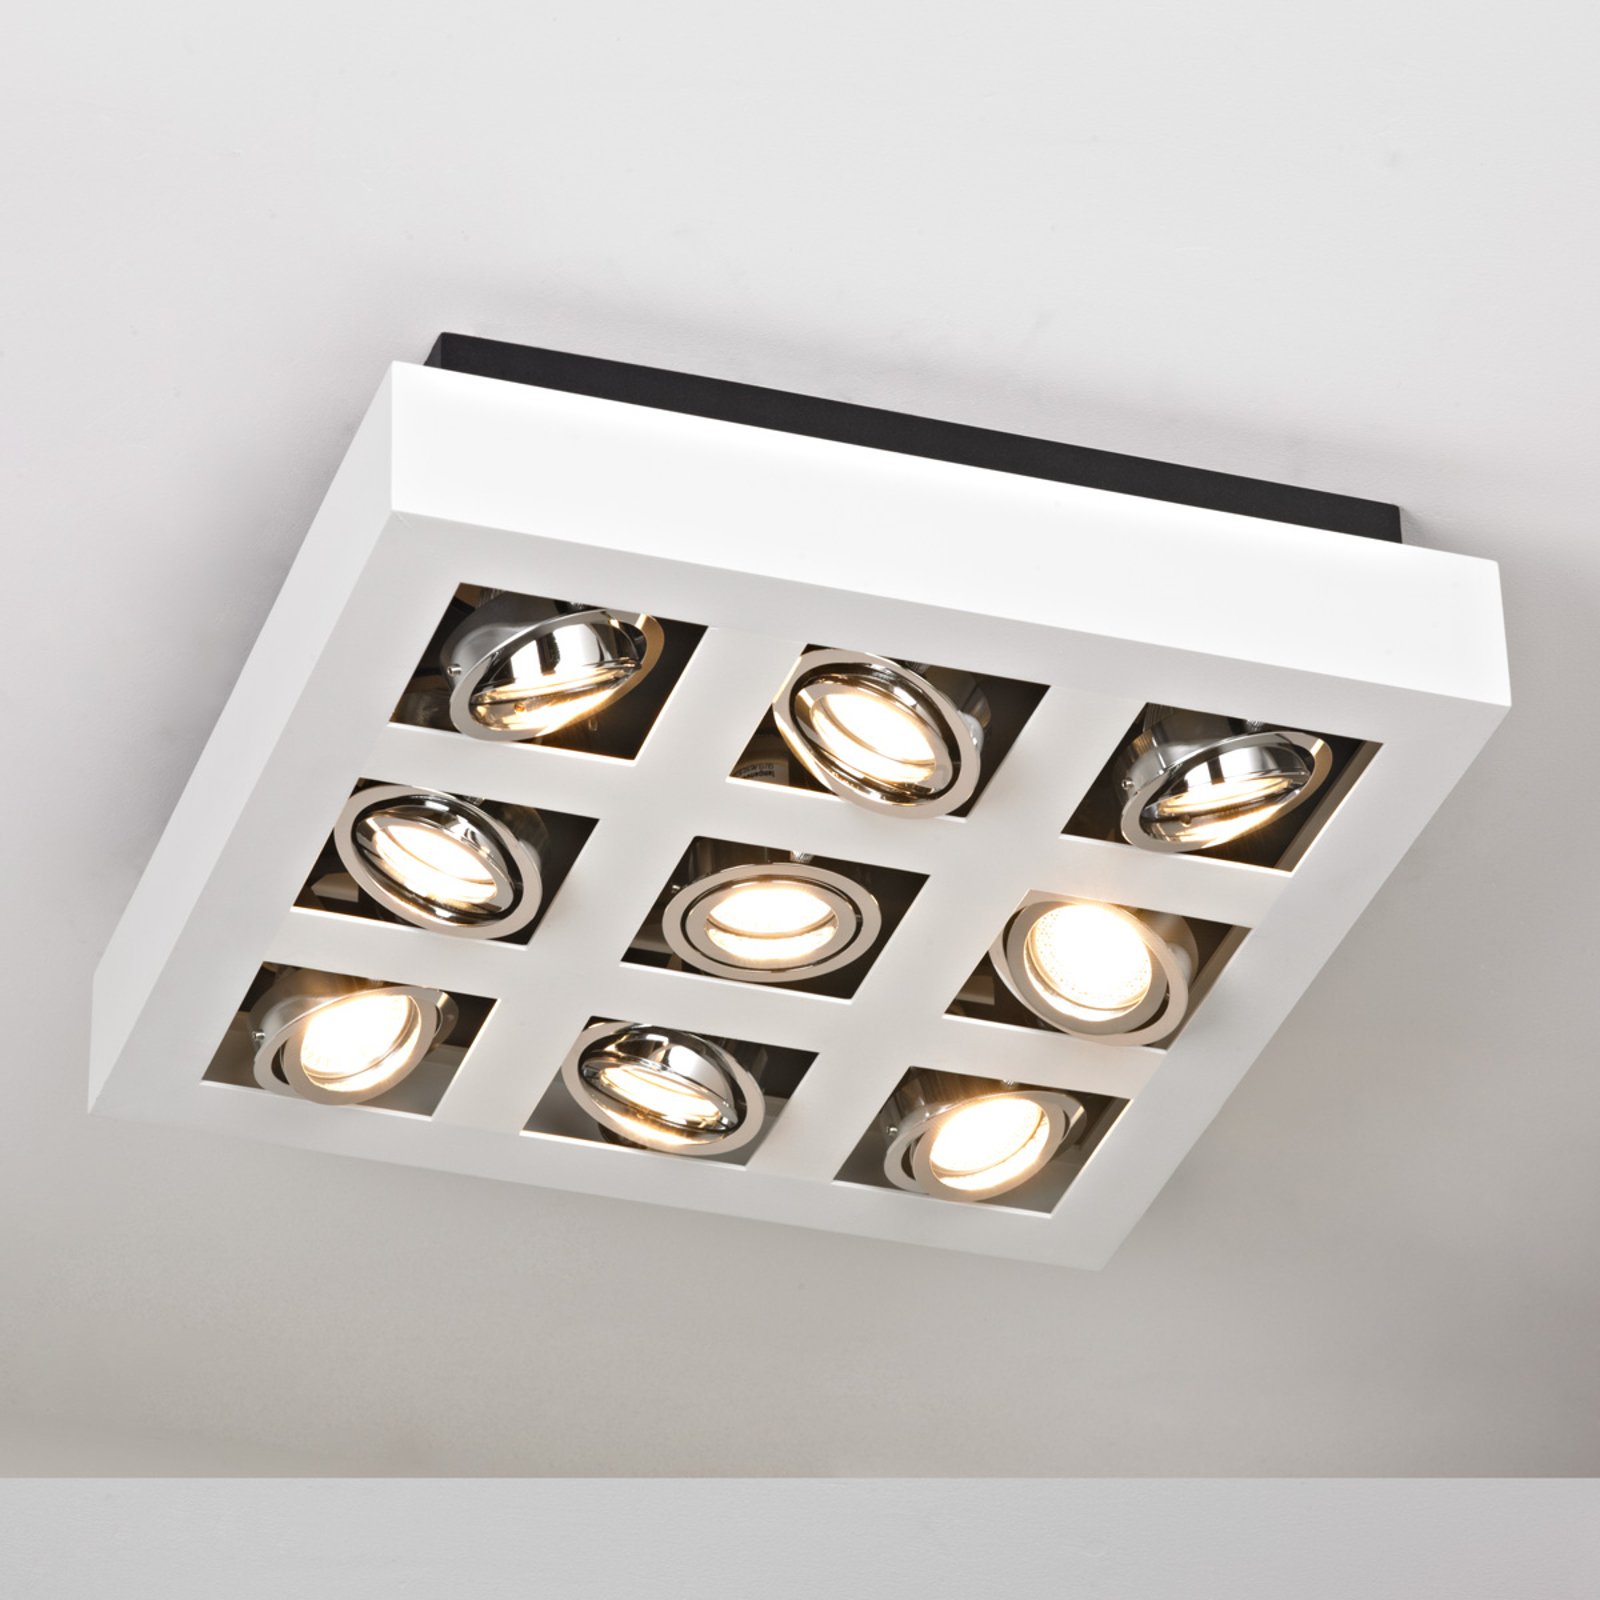 Hell leuchtende LED-Deckenleuchte Vince, 9-flammig